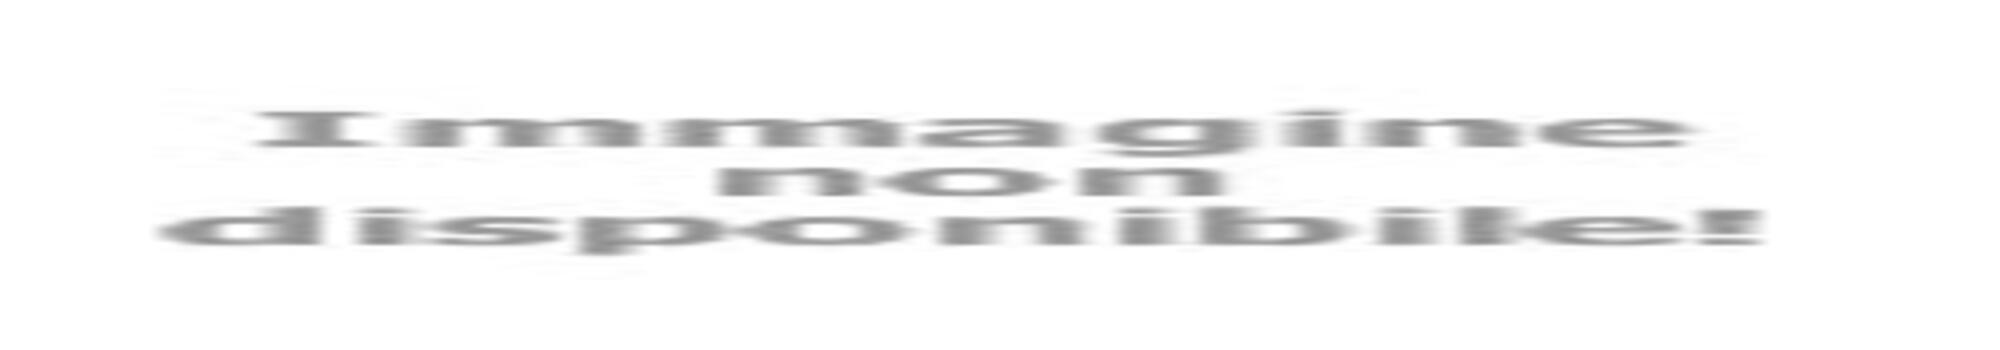 Ferier i Bibione: Weekend eller en uge?